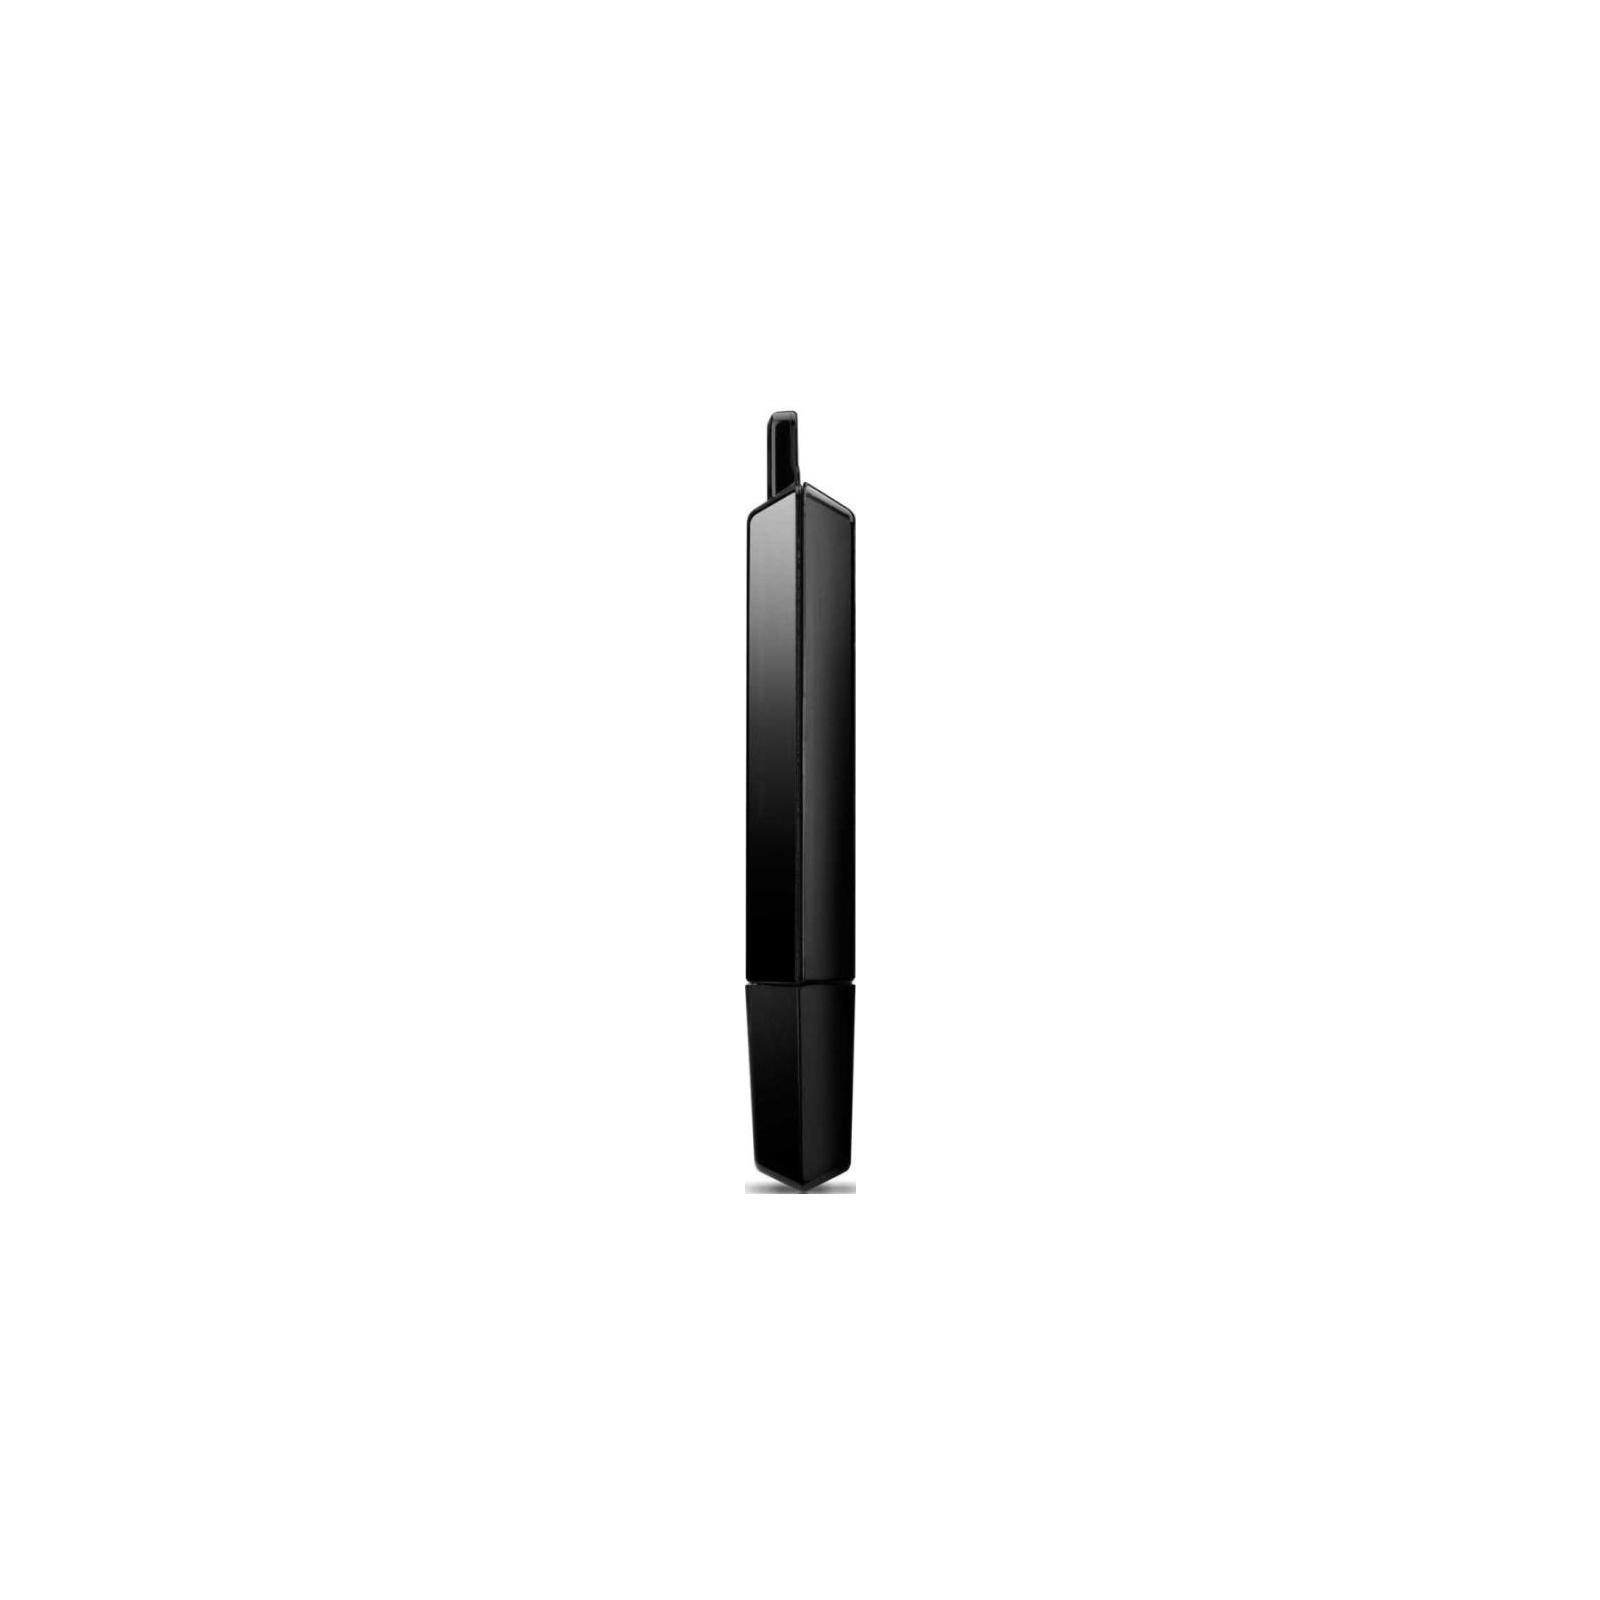 USB флеш накопитель 32GB AH352 Black RP USB3.0 Apacer (AP32GAH352B-1) изображение 3